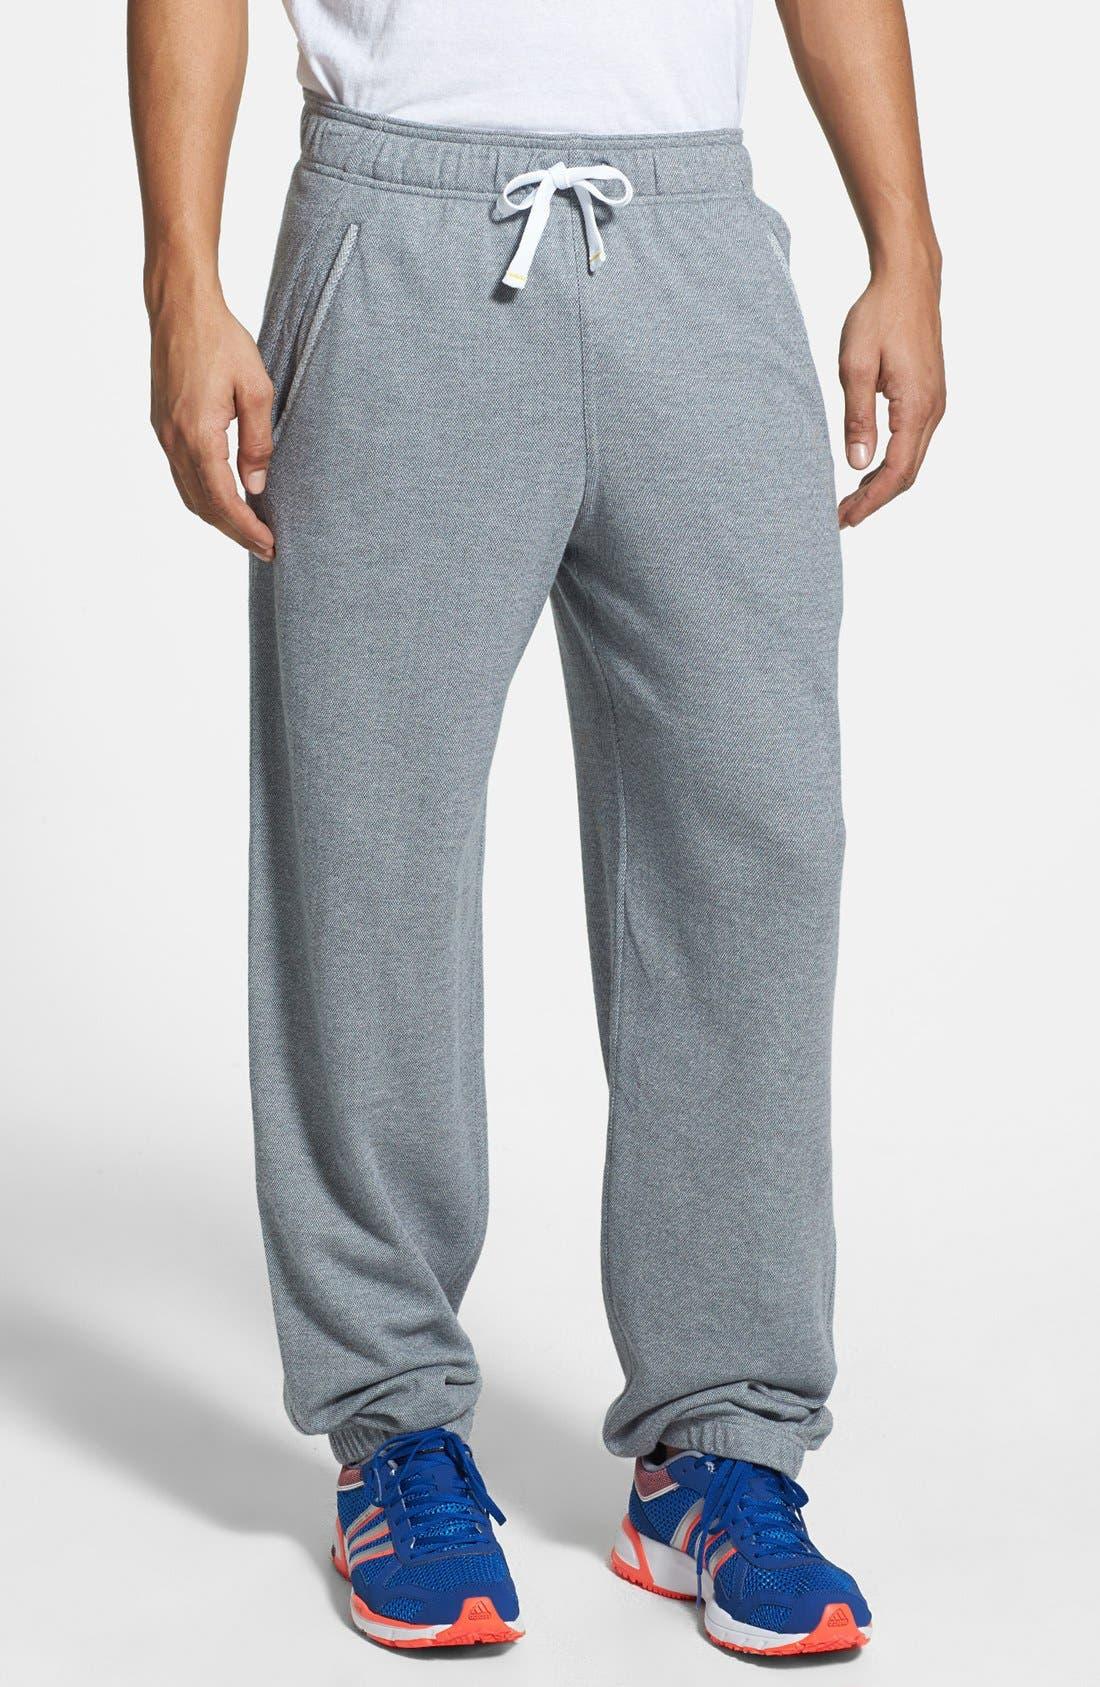 Main Image - adidas 'Epic' Herringbone Knit Pants